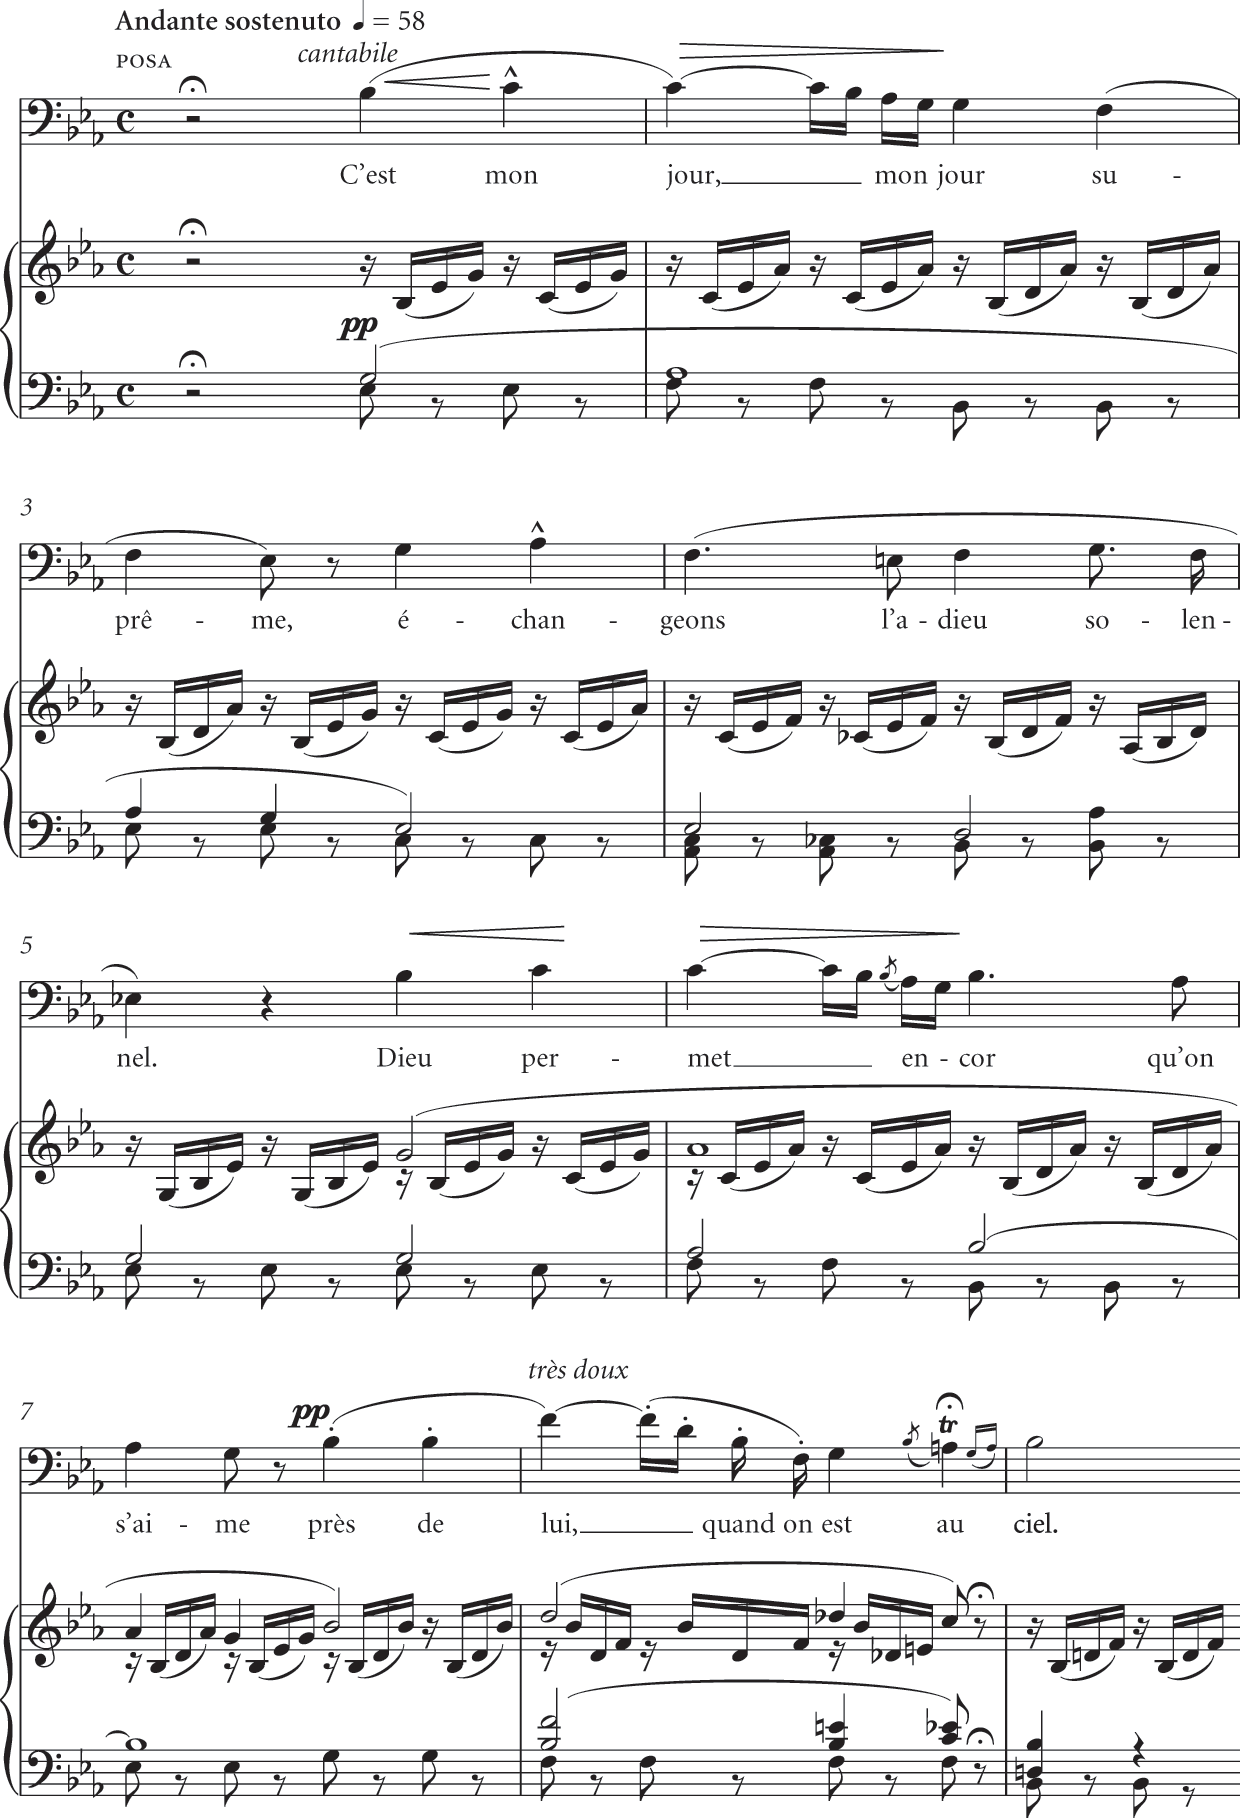 Verdi, Victor Maurel, and the operatic interpreter (Chapter